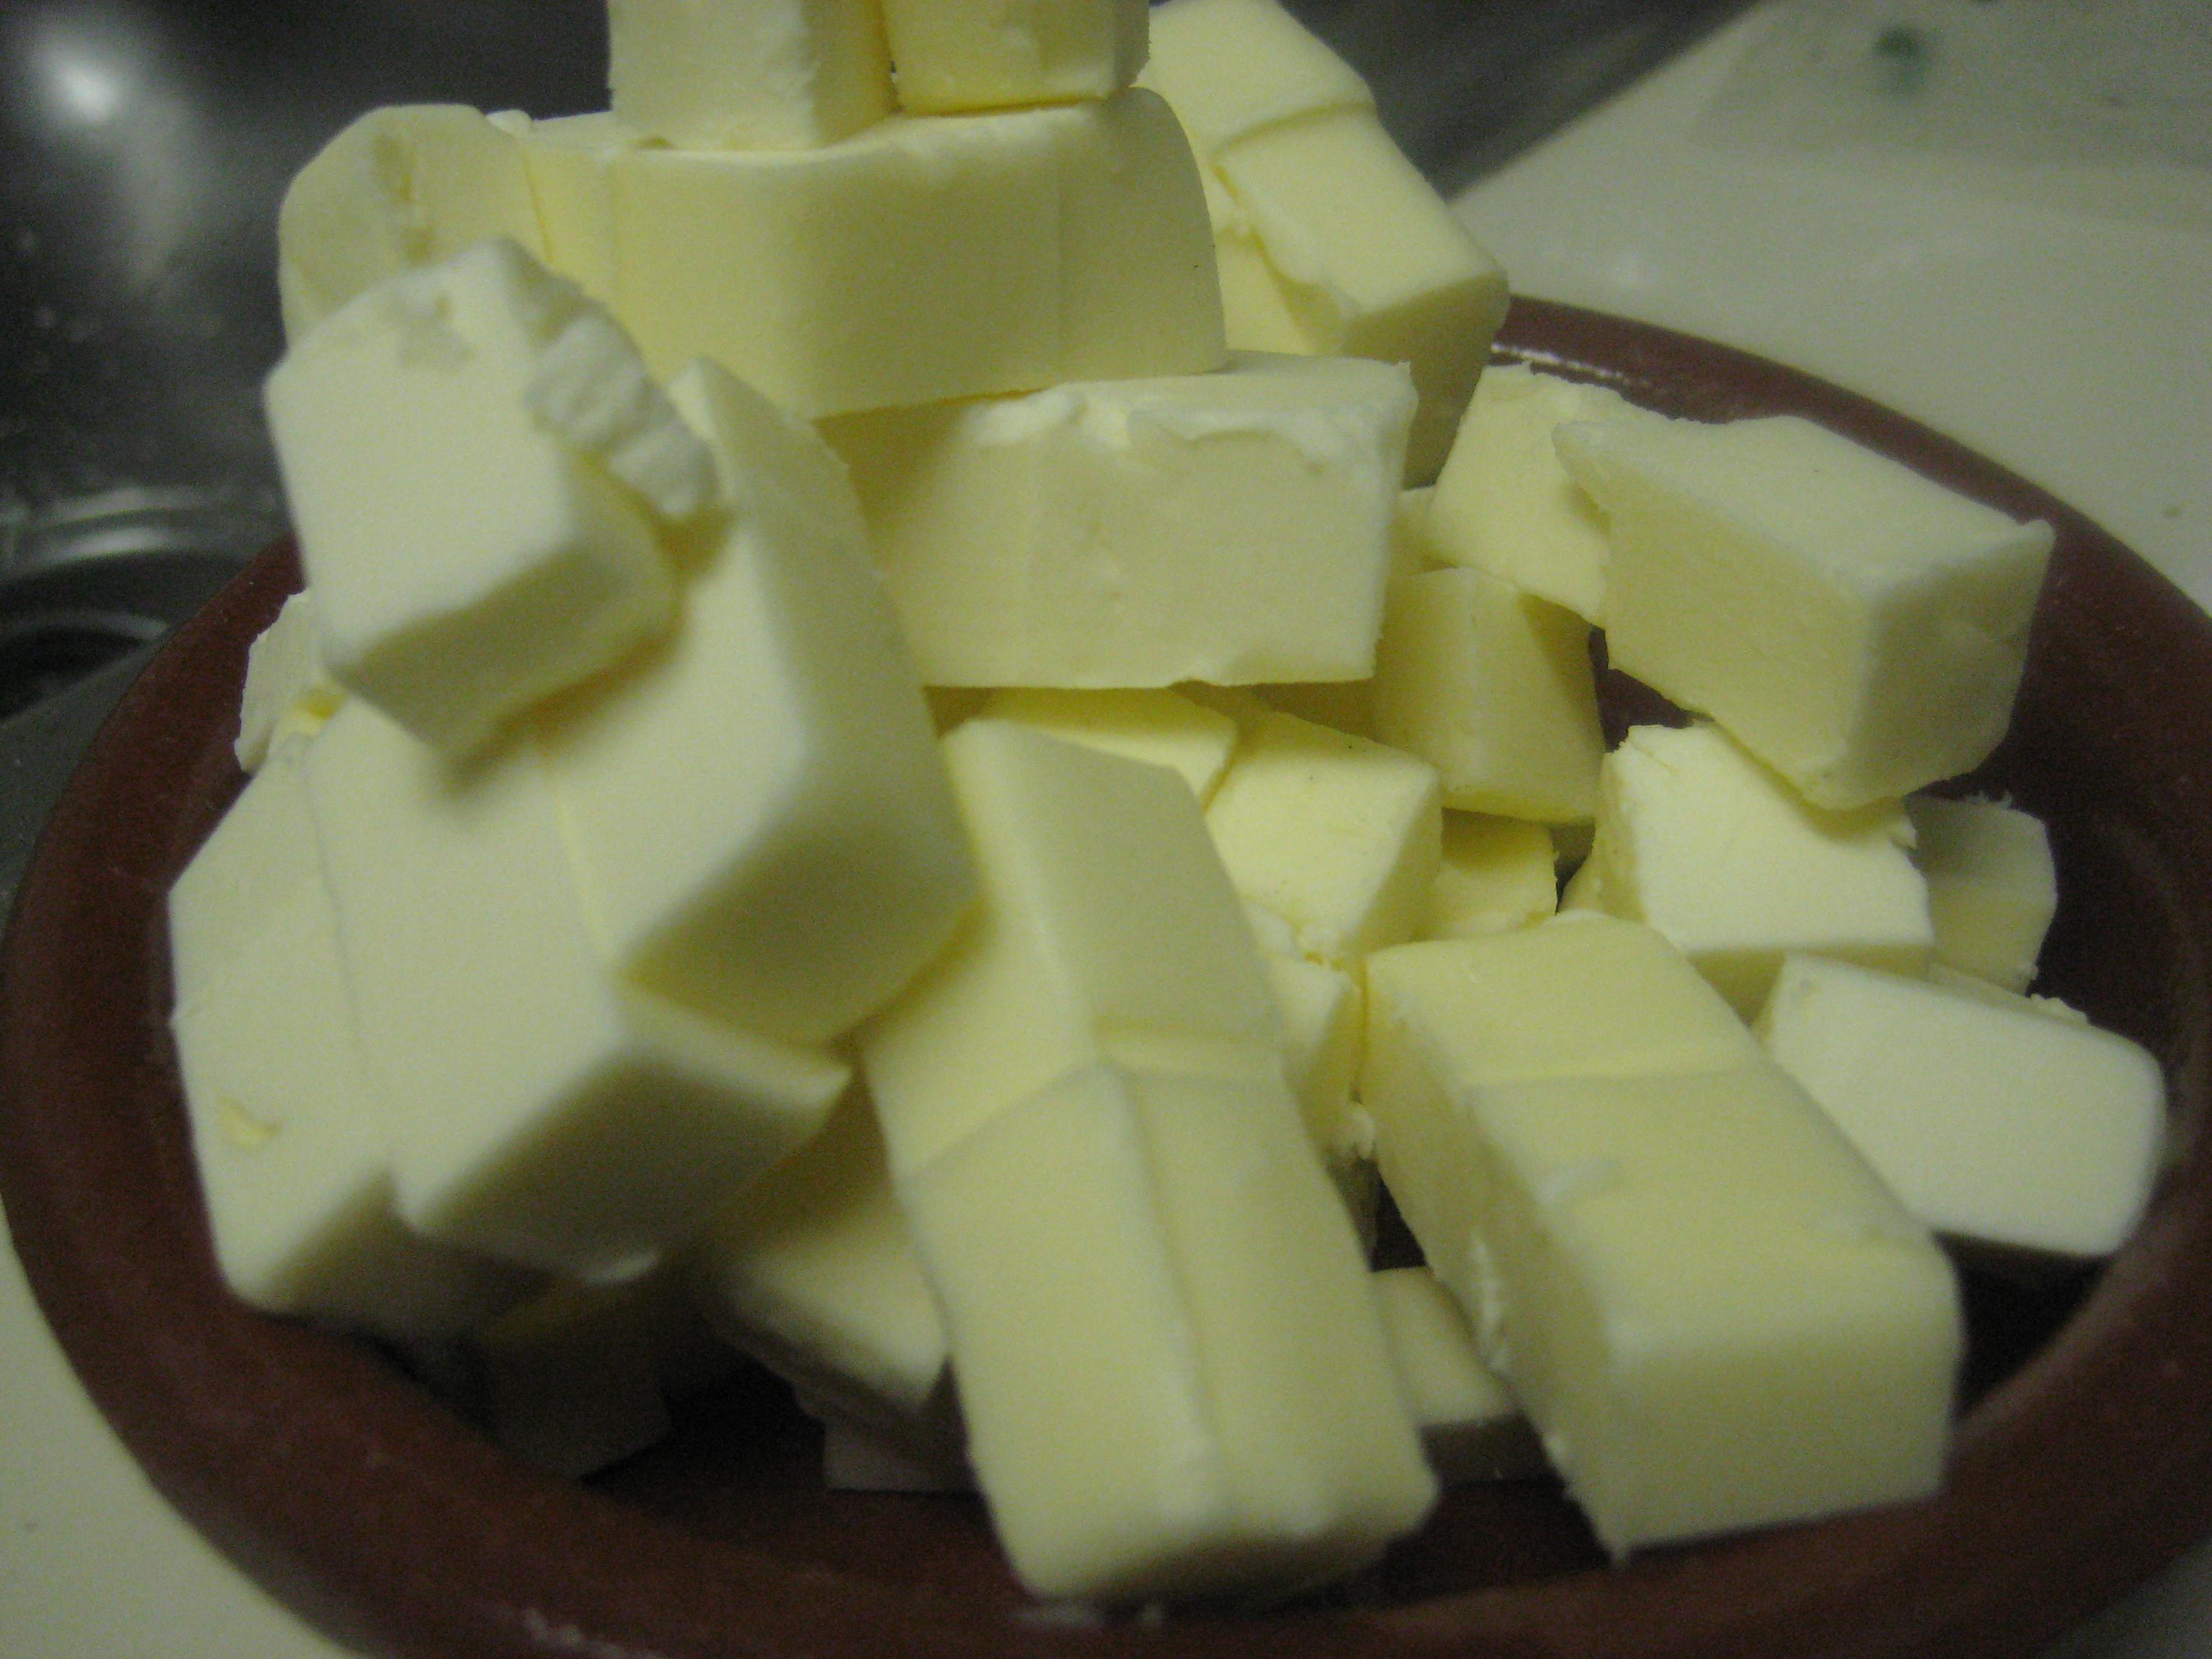 ... Days of Edible Gifts: Parmesan Black Pepper Biscotti | POPSUGAR Food